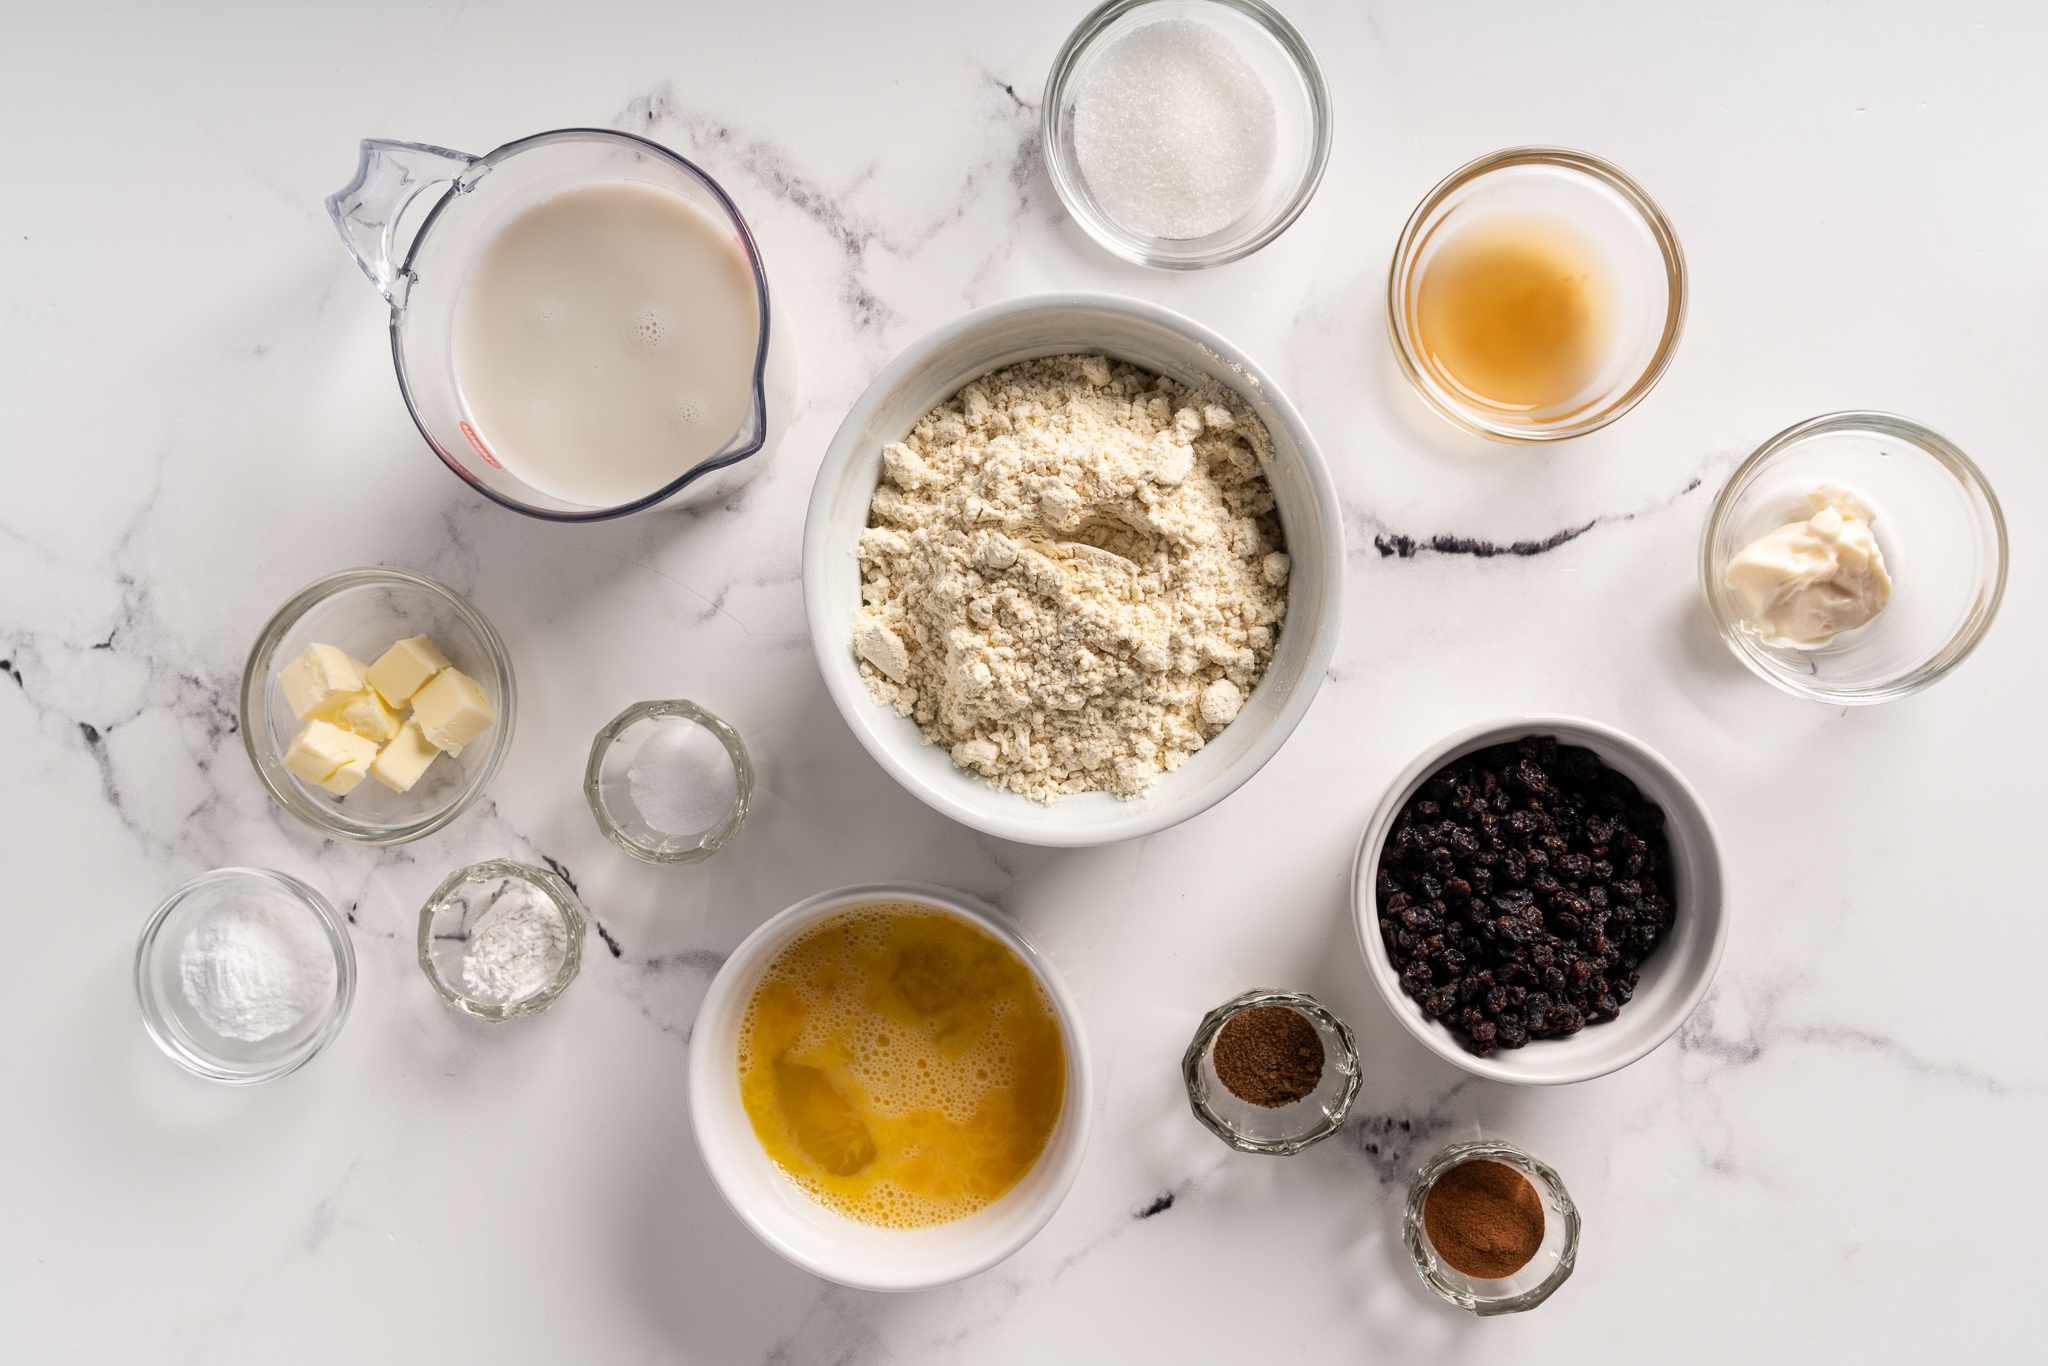 Gluten-Free and Dairy-Free Irish Soda Bread ingredients